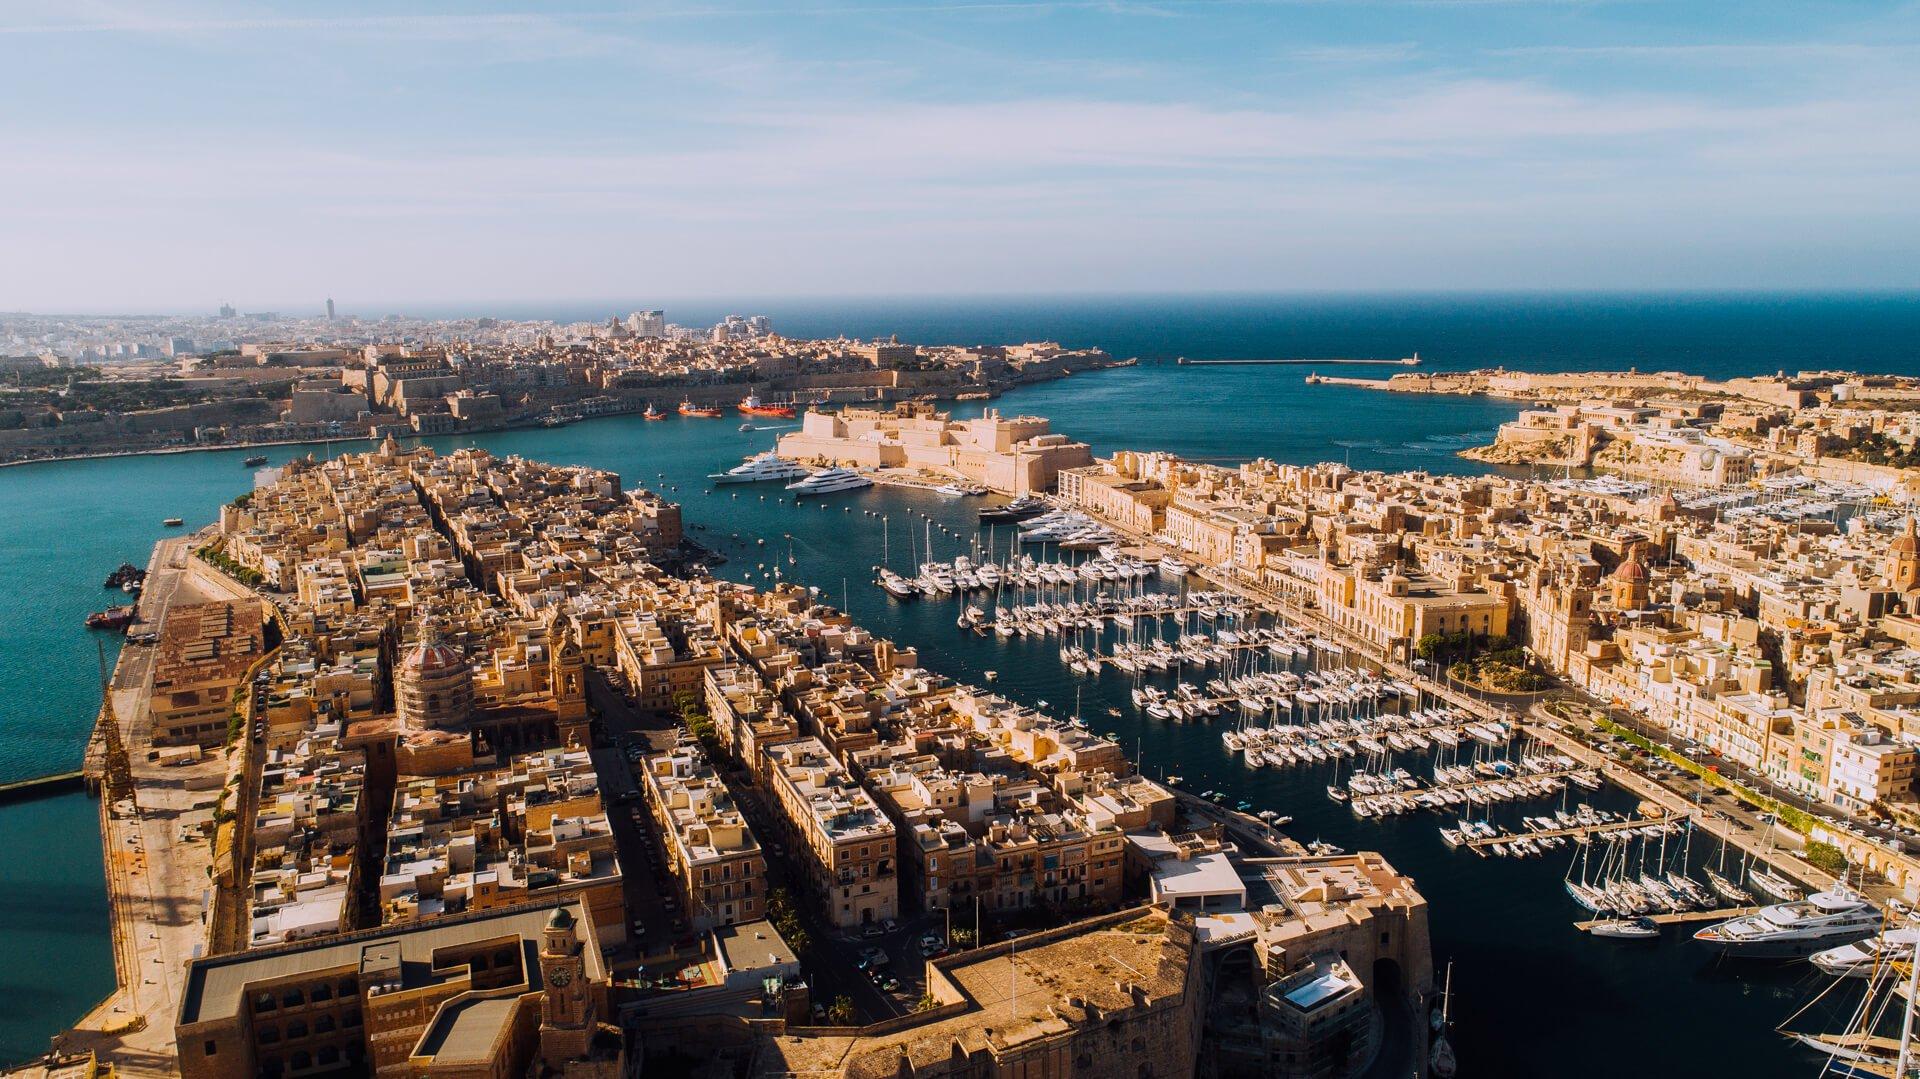 Aerial View of Three Cities, Malta